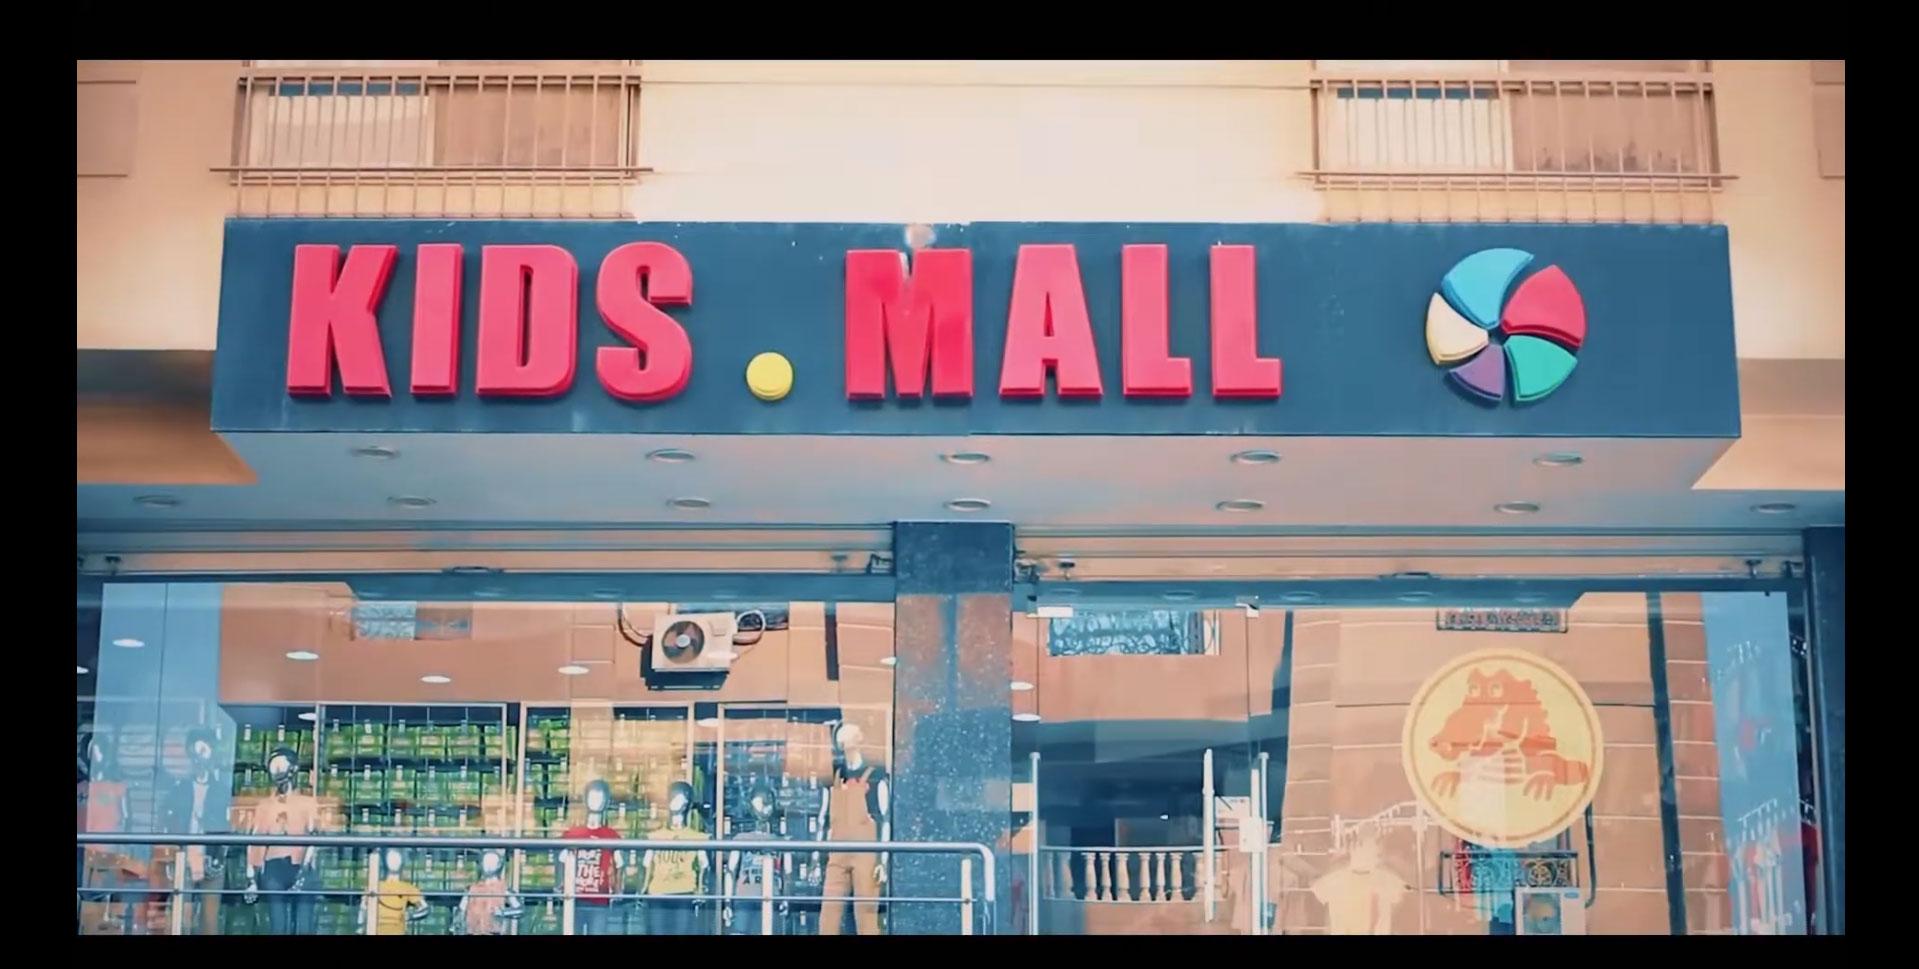 Kids Mall - إنتاج الفيديوهات -